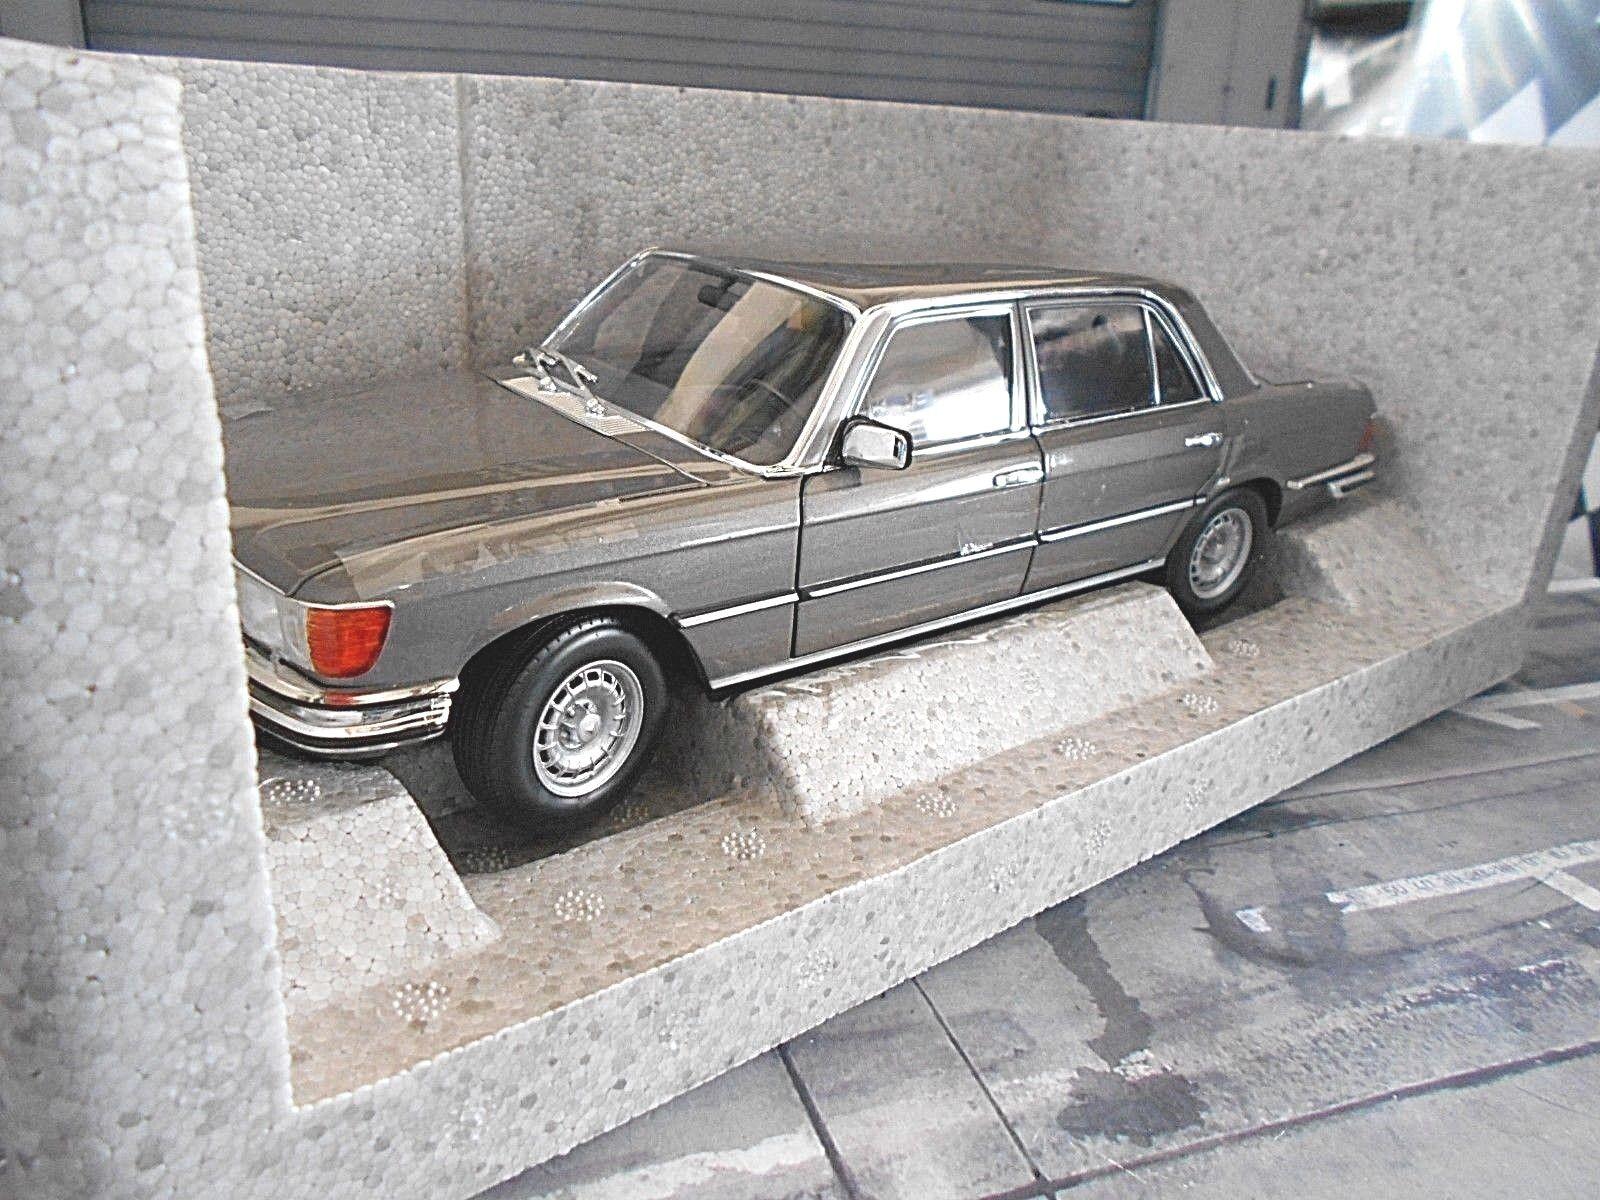 Mercedes benz clase s w116 450 sel 6.9 1976 gris Gris met. norev nuevo 1 18